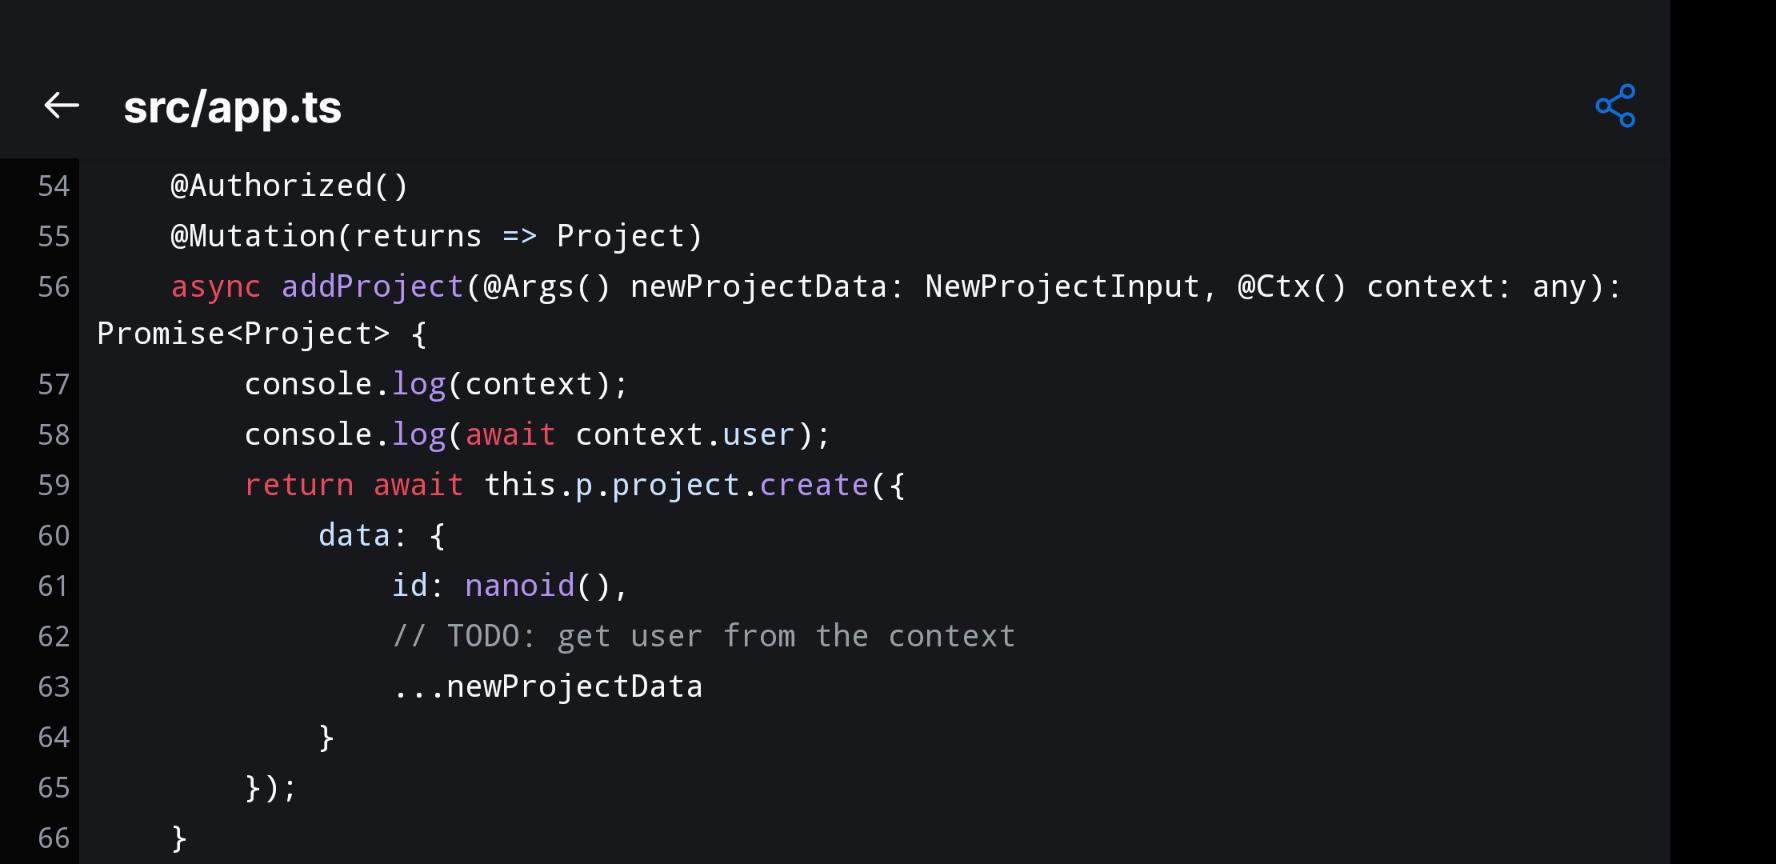 https://cloud-ko2m6kfx7-hack-club-bot.vercel.app/0screenshot_20210306-141620.png